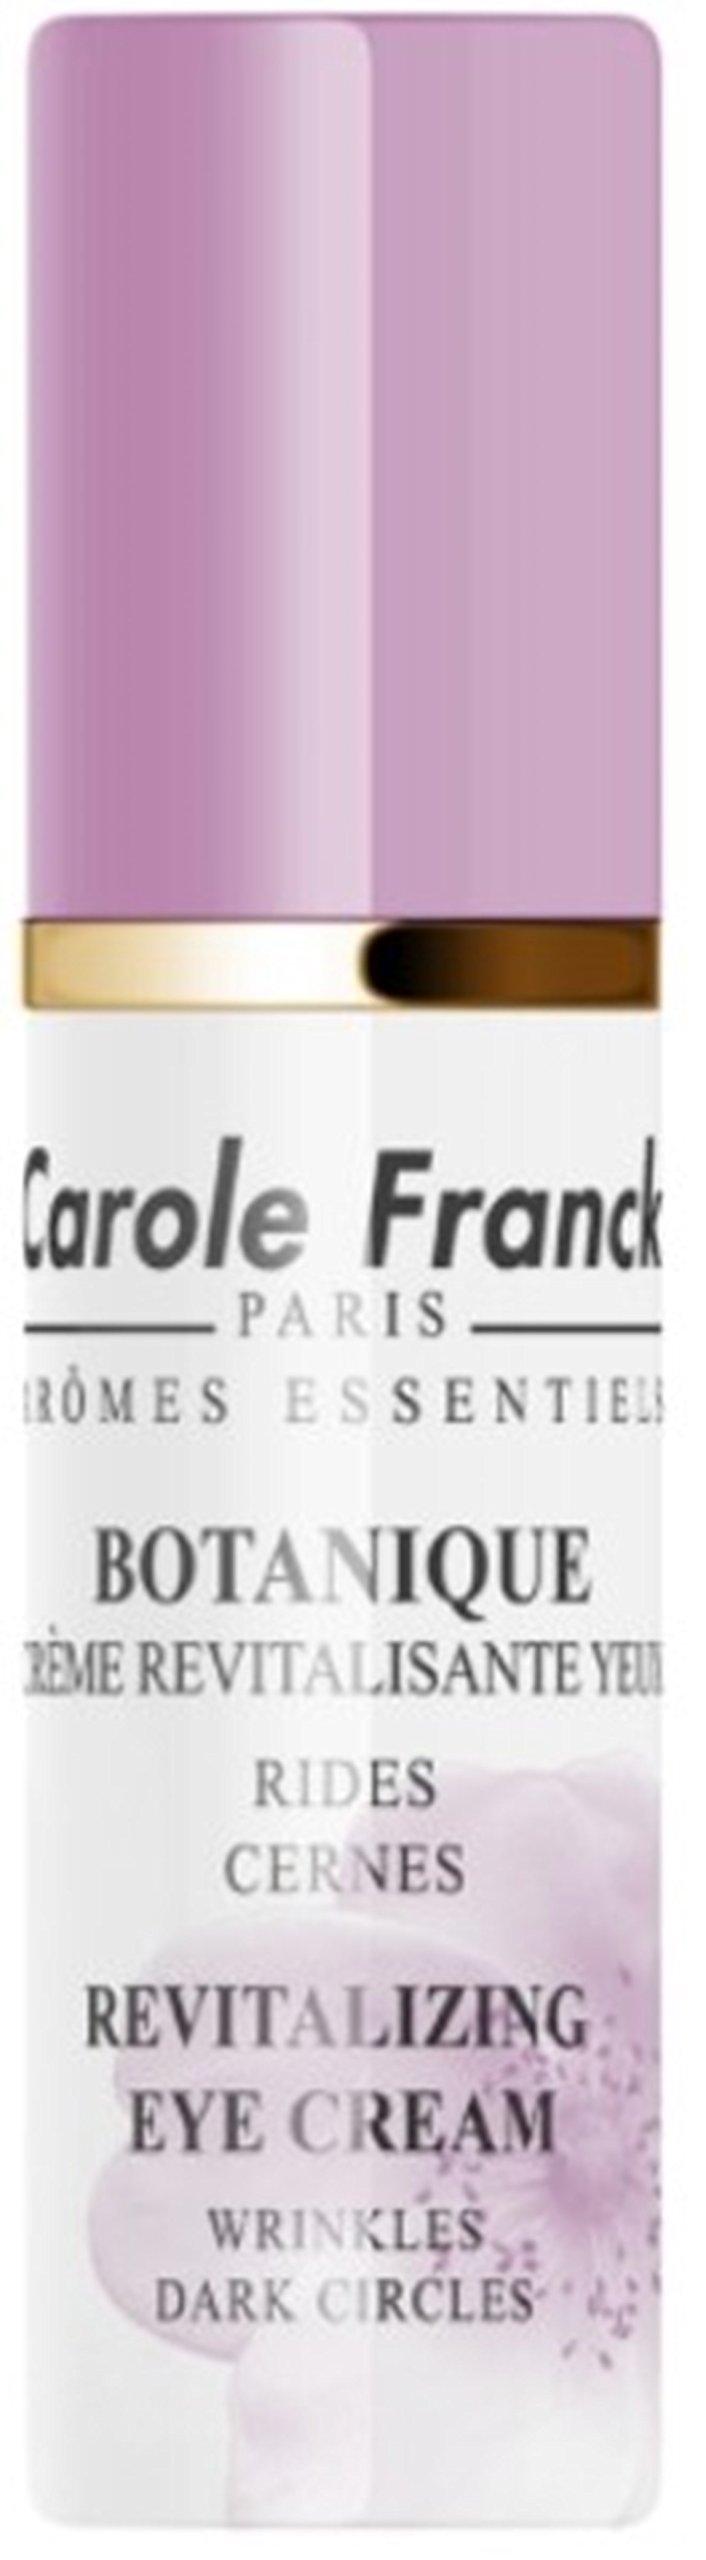 Carole Franck Gel PAUPIERES Eye Gel 15 ml